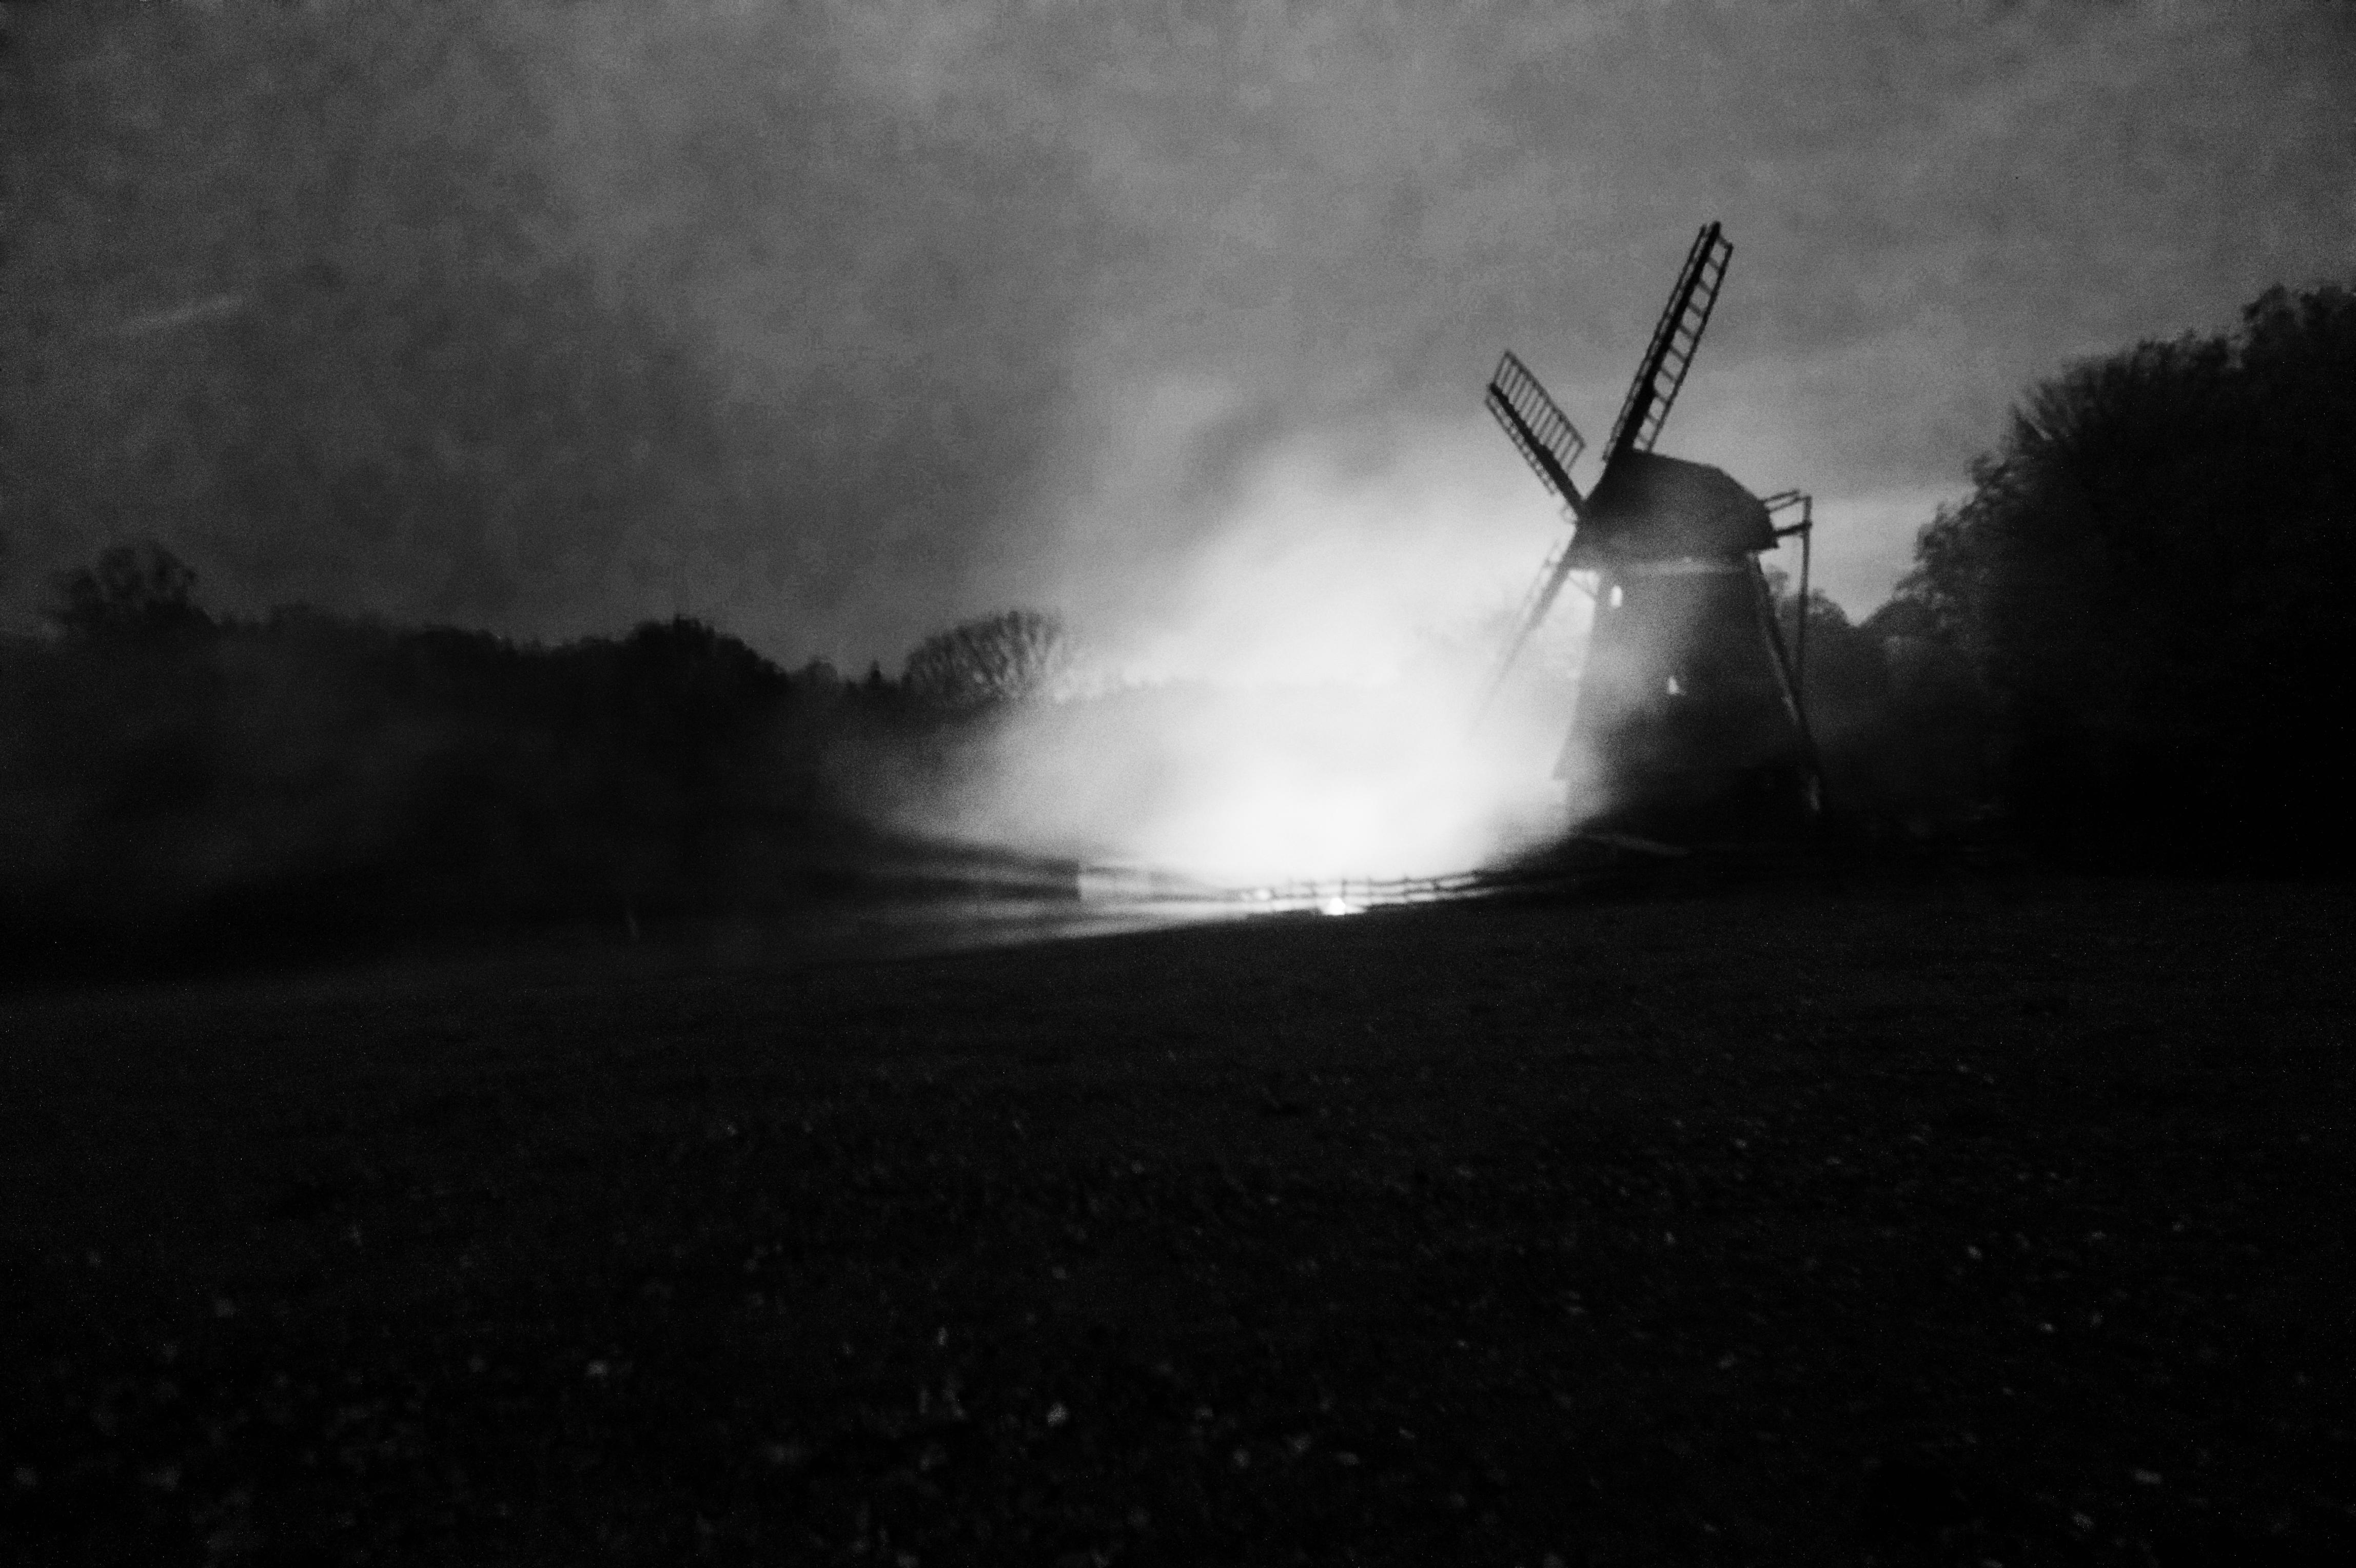 Magical windmill